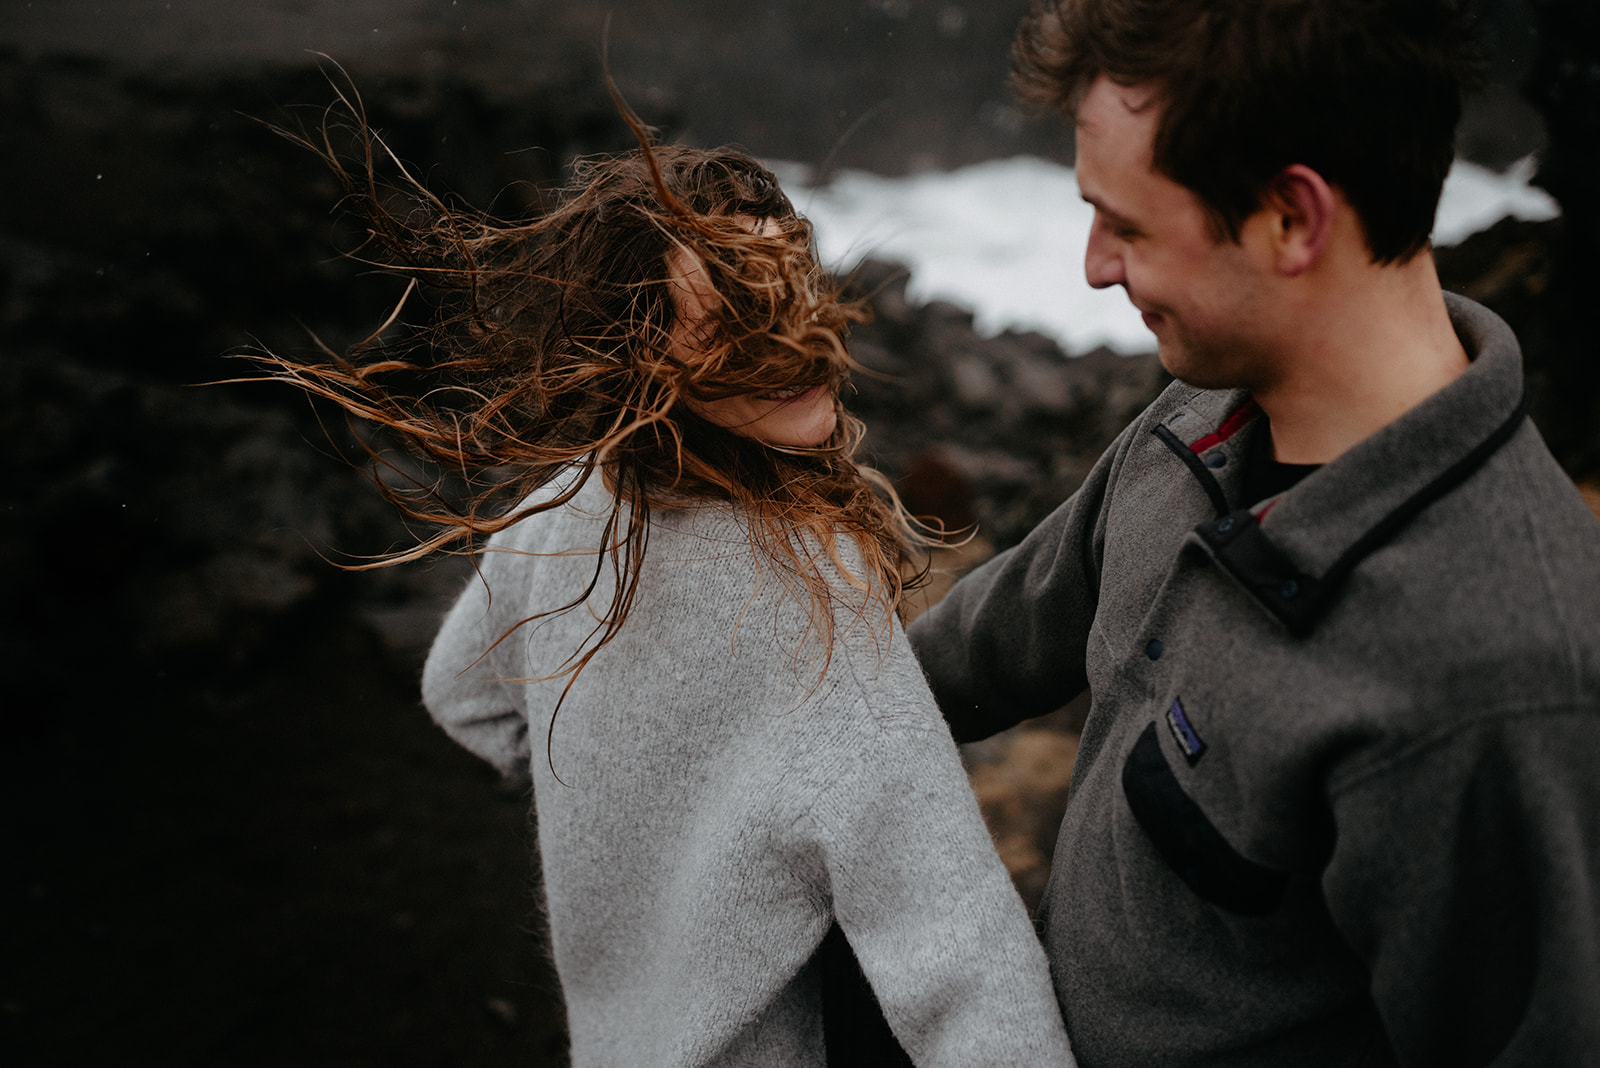 Mack & Michael - Sesja na Islandii 8 alebosco islandia mm 8